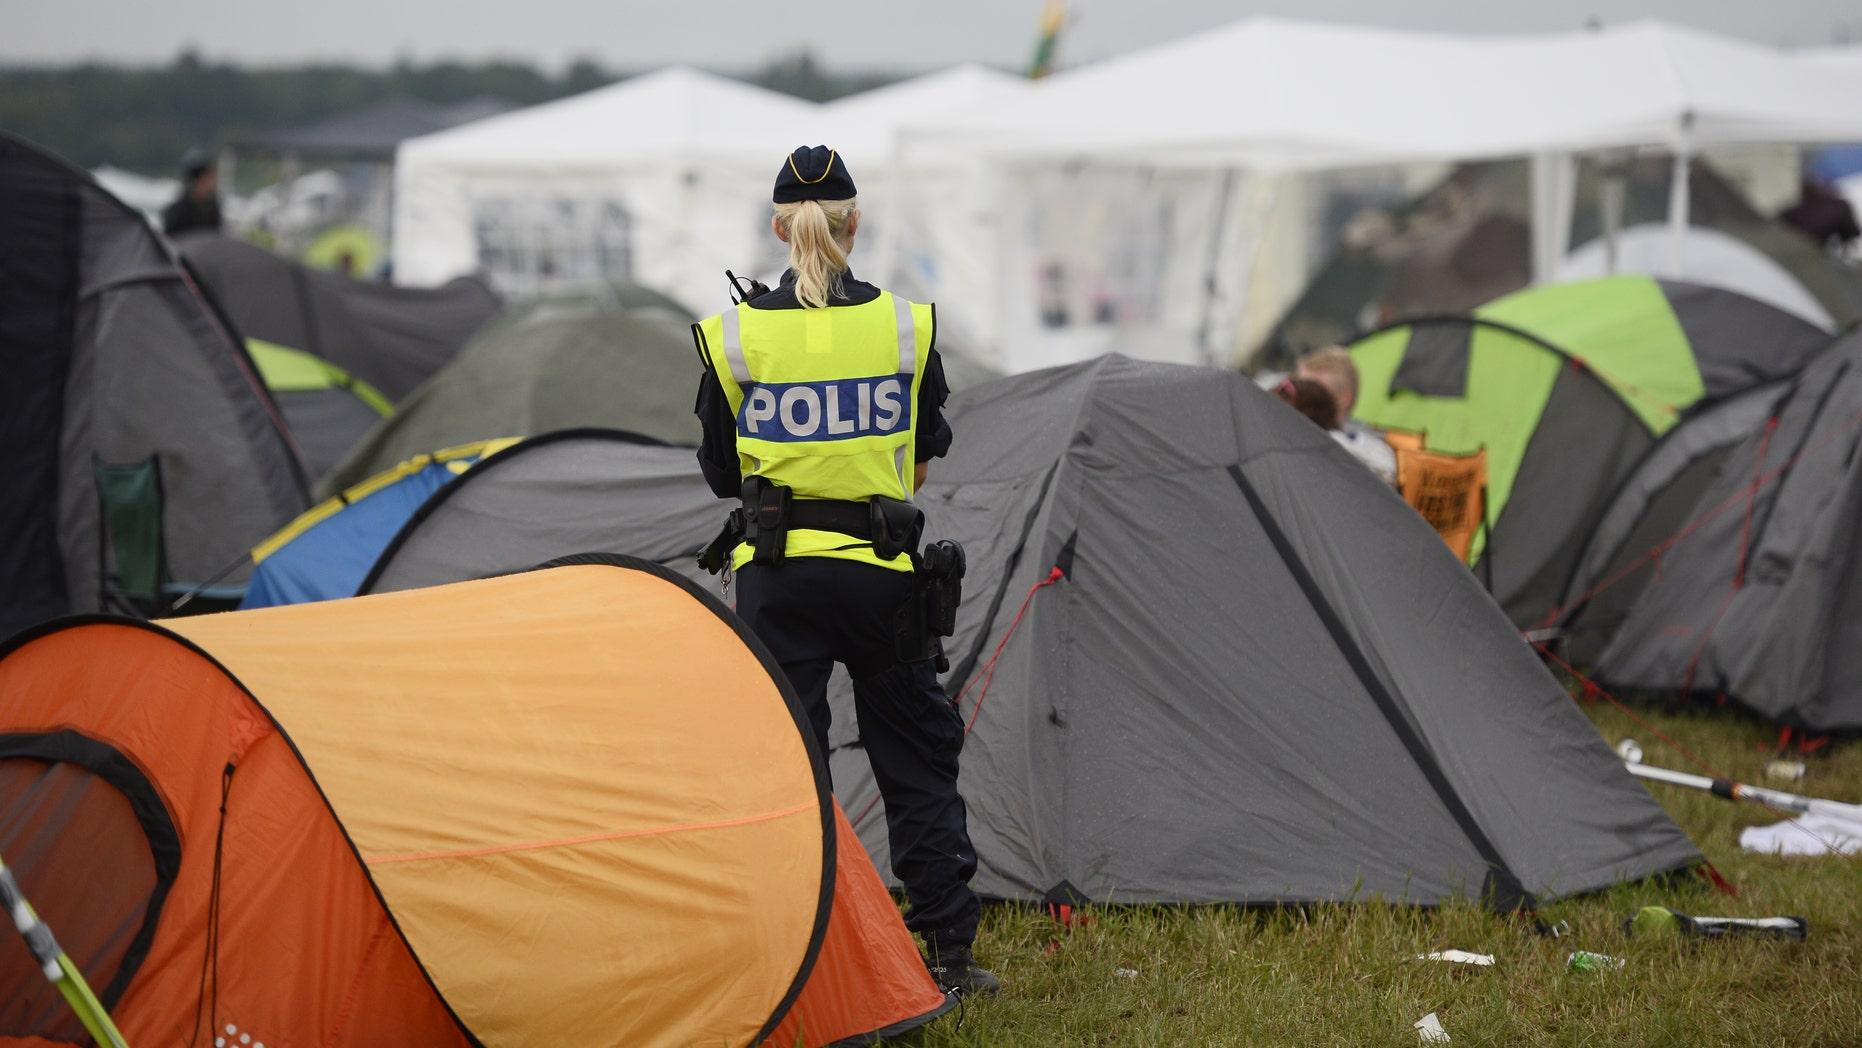 Security in a campsite at the Bravalla Festival.